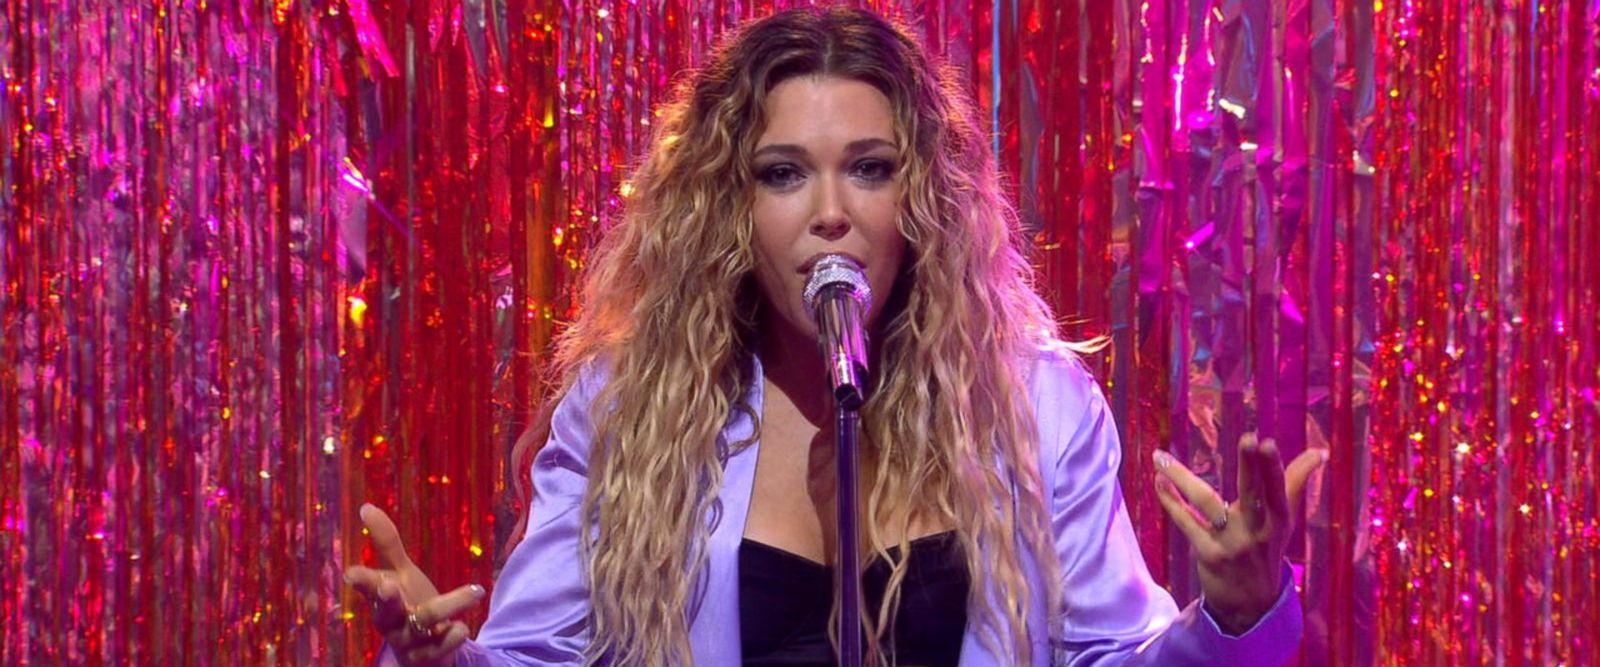 VIDEO: Rachel Platten rocks out to 'Broken Glass' live on 'GMA'